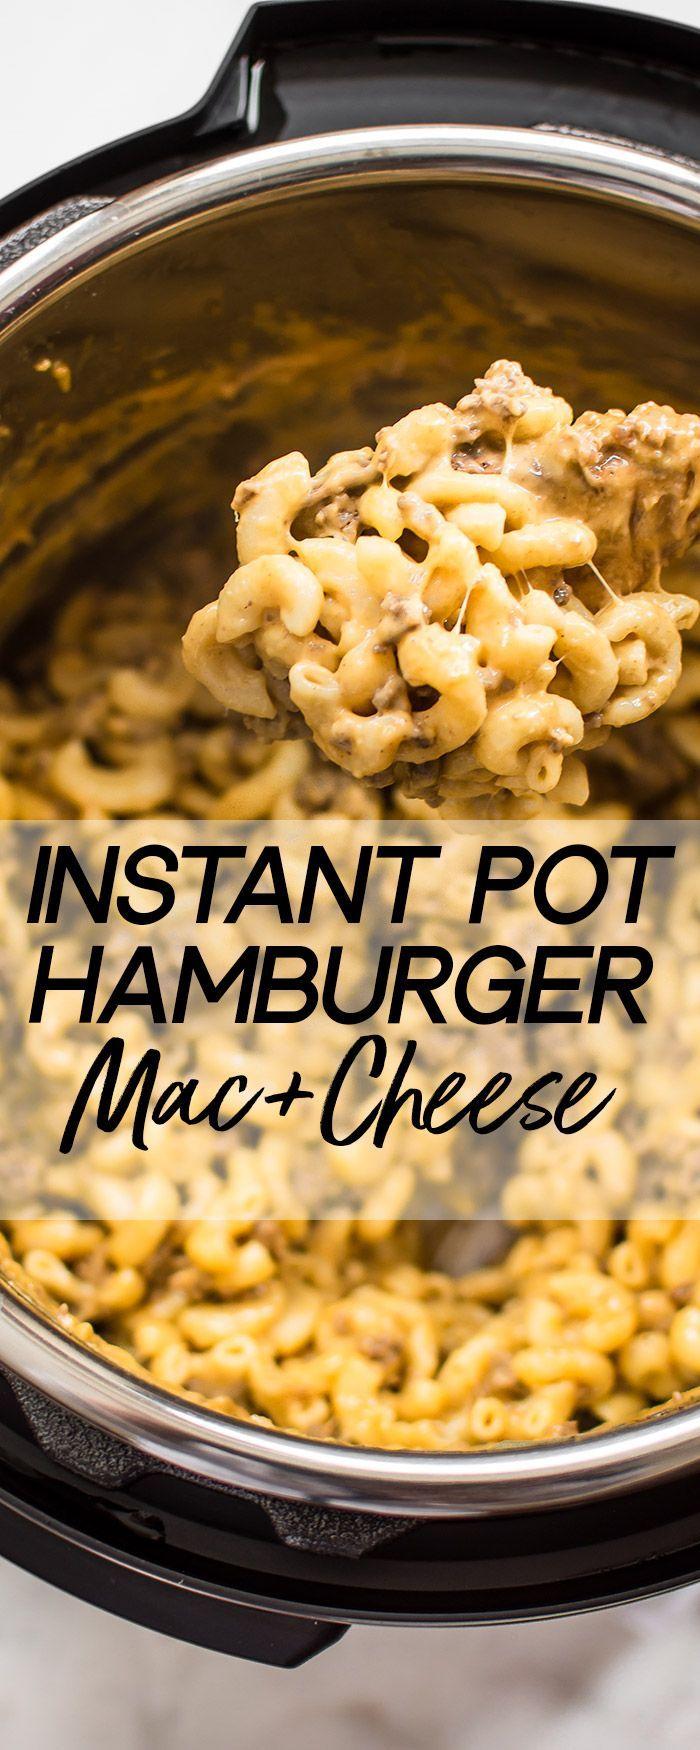 Instant Pot Hamburger Mac and Cheese #hamburgermeatrecipes